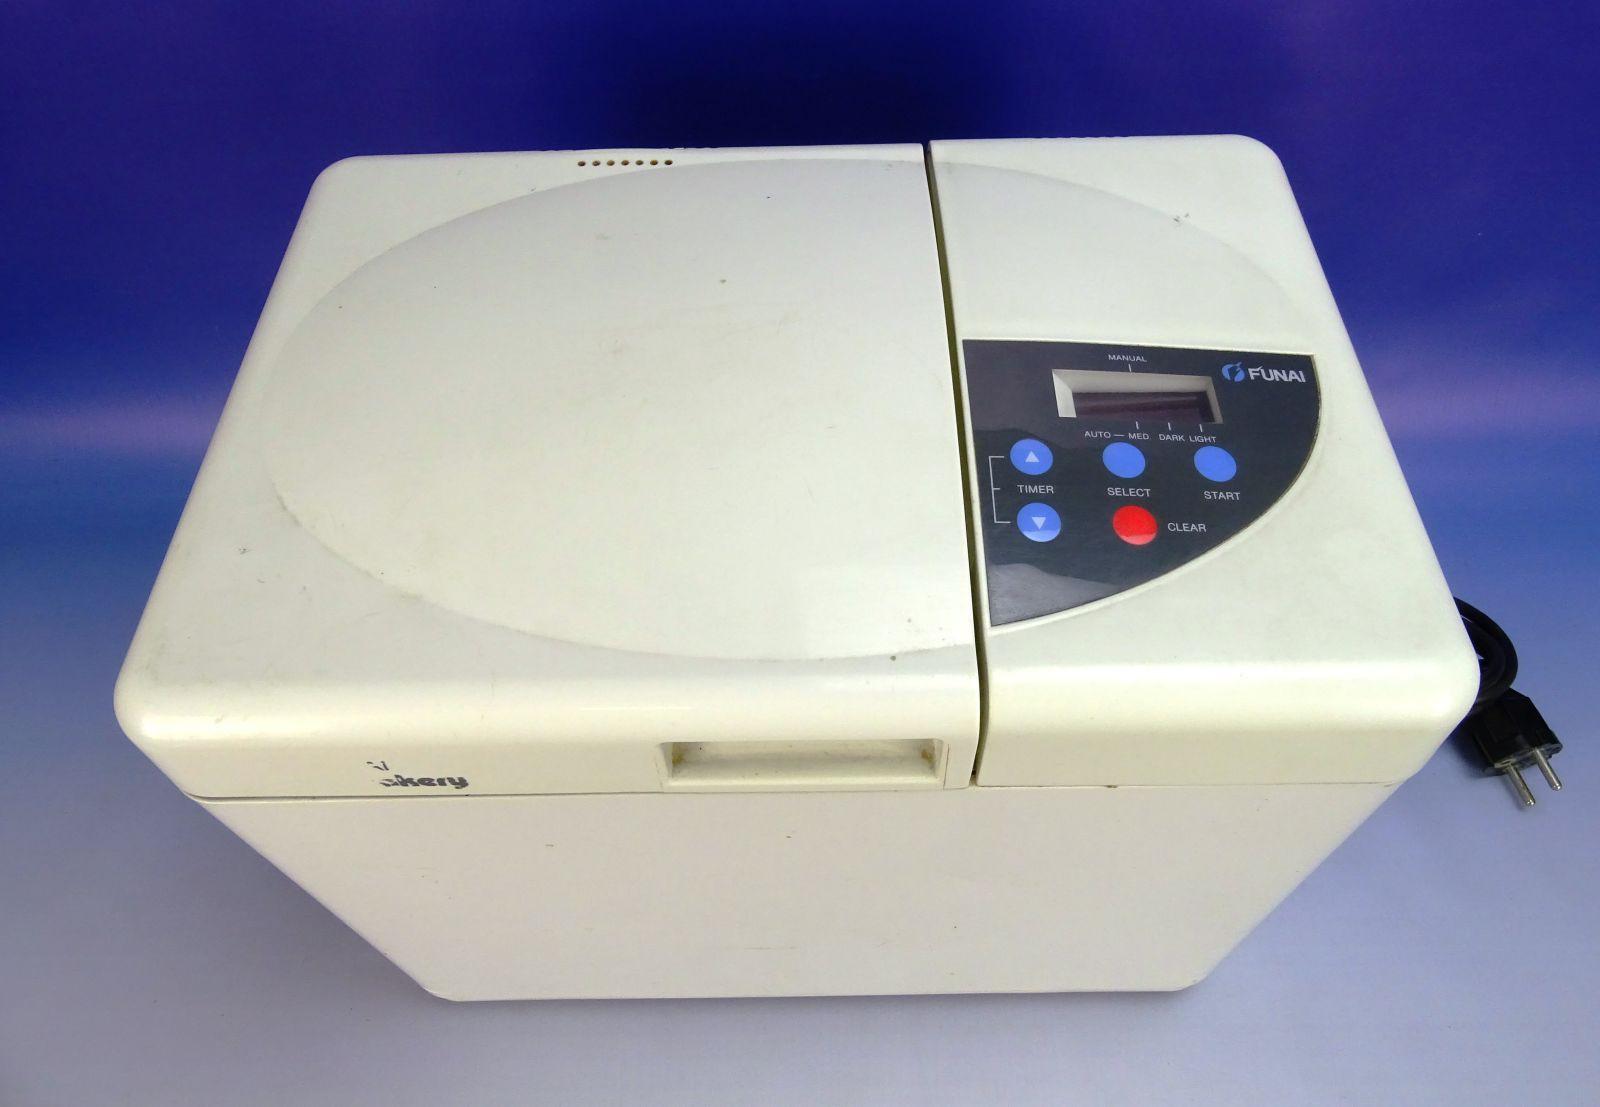 DSC01803.JPG (1600×1107)